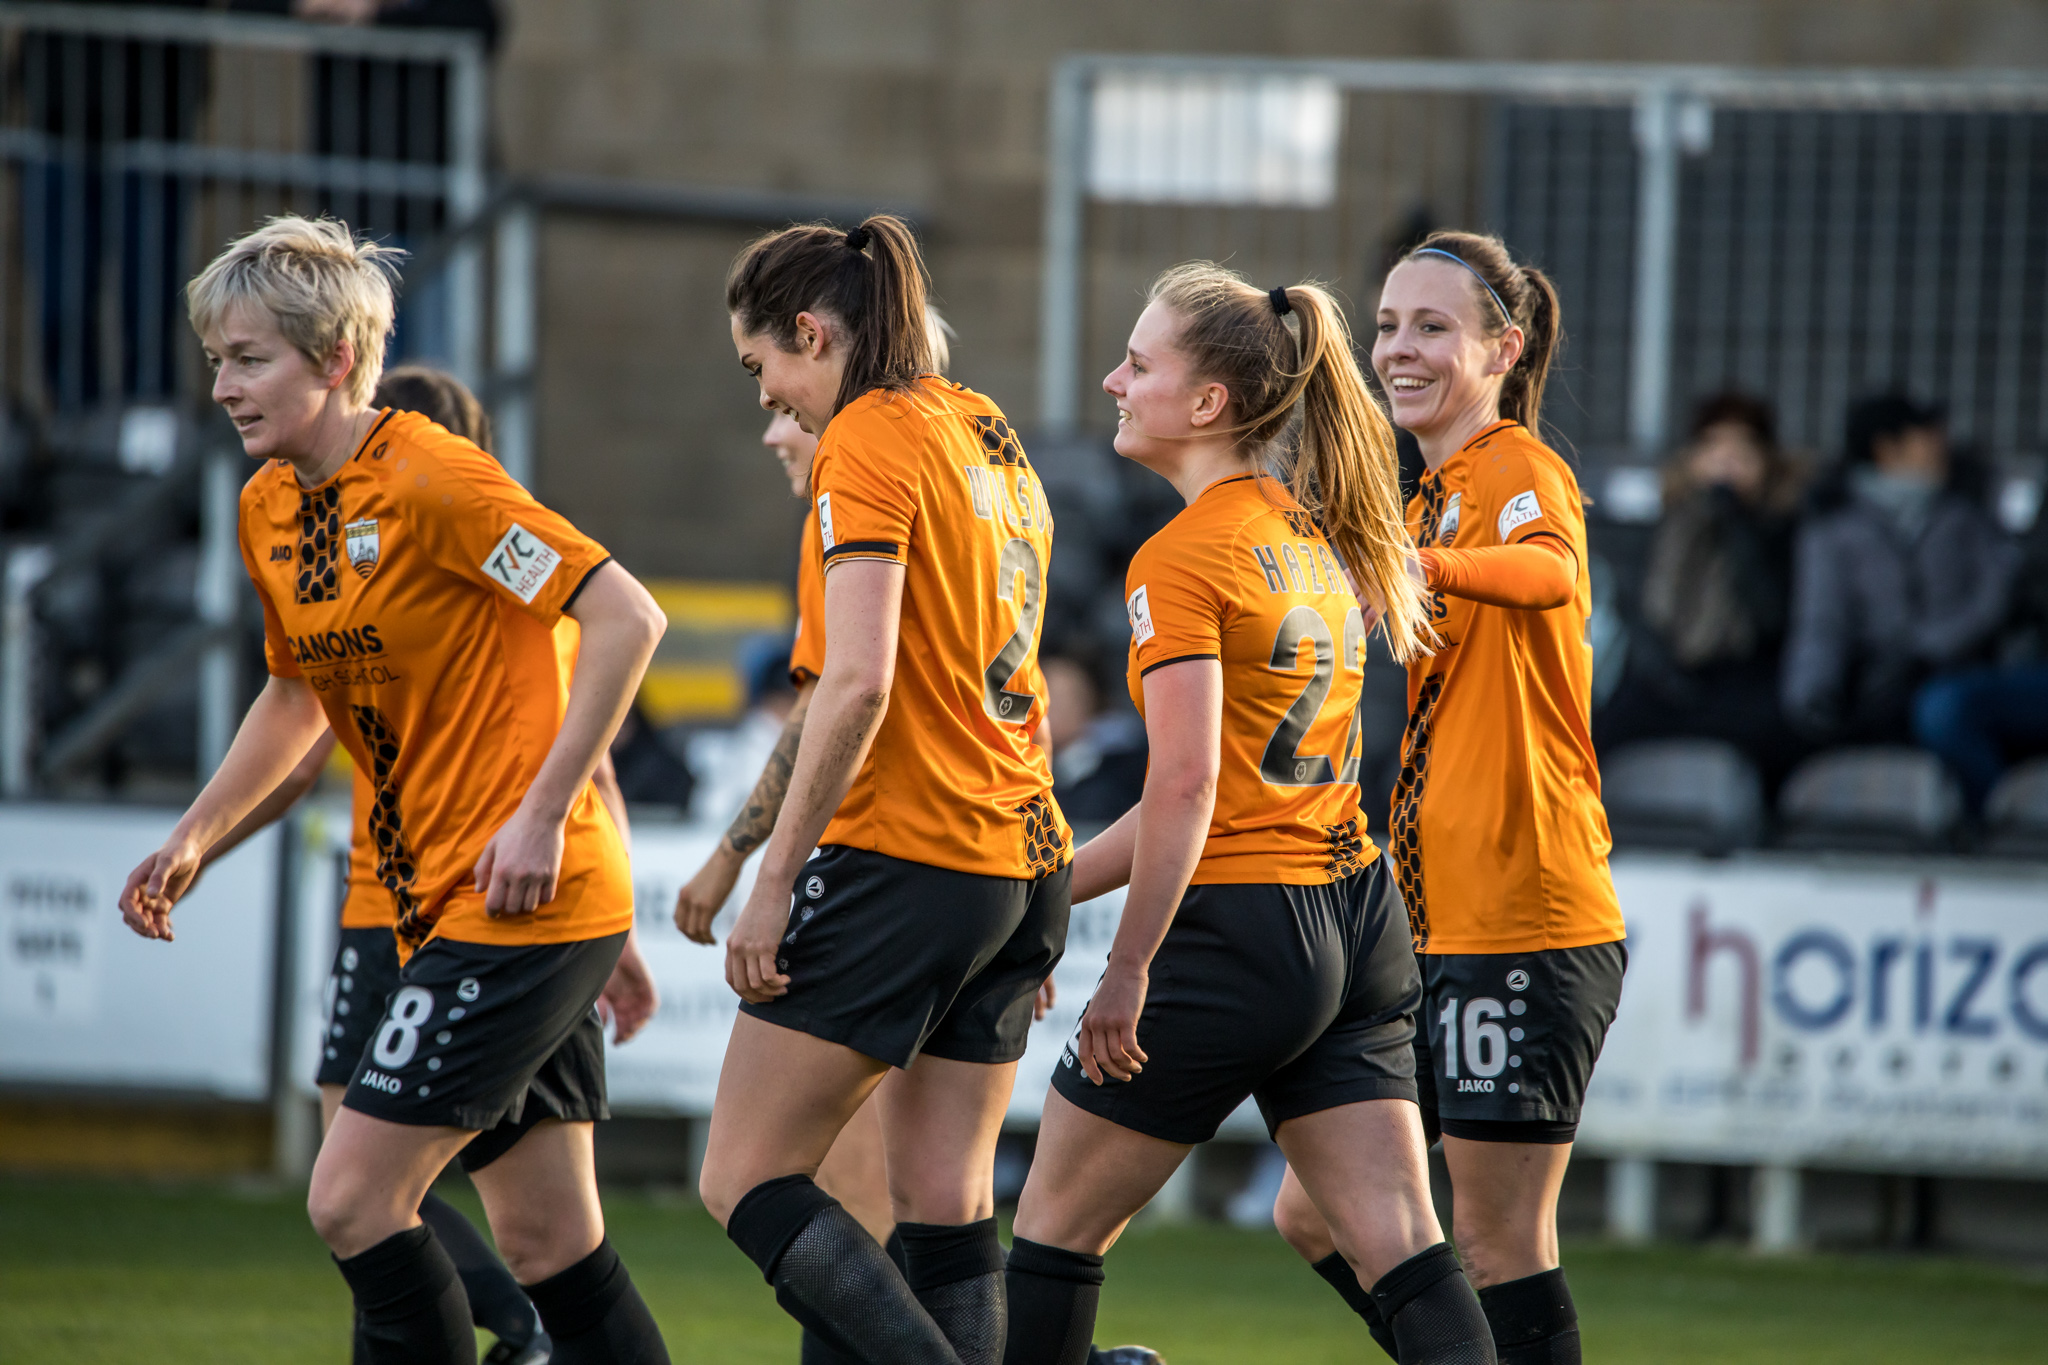 Amelia Hazard earns Lionesses call up